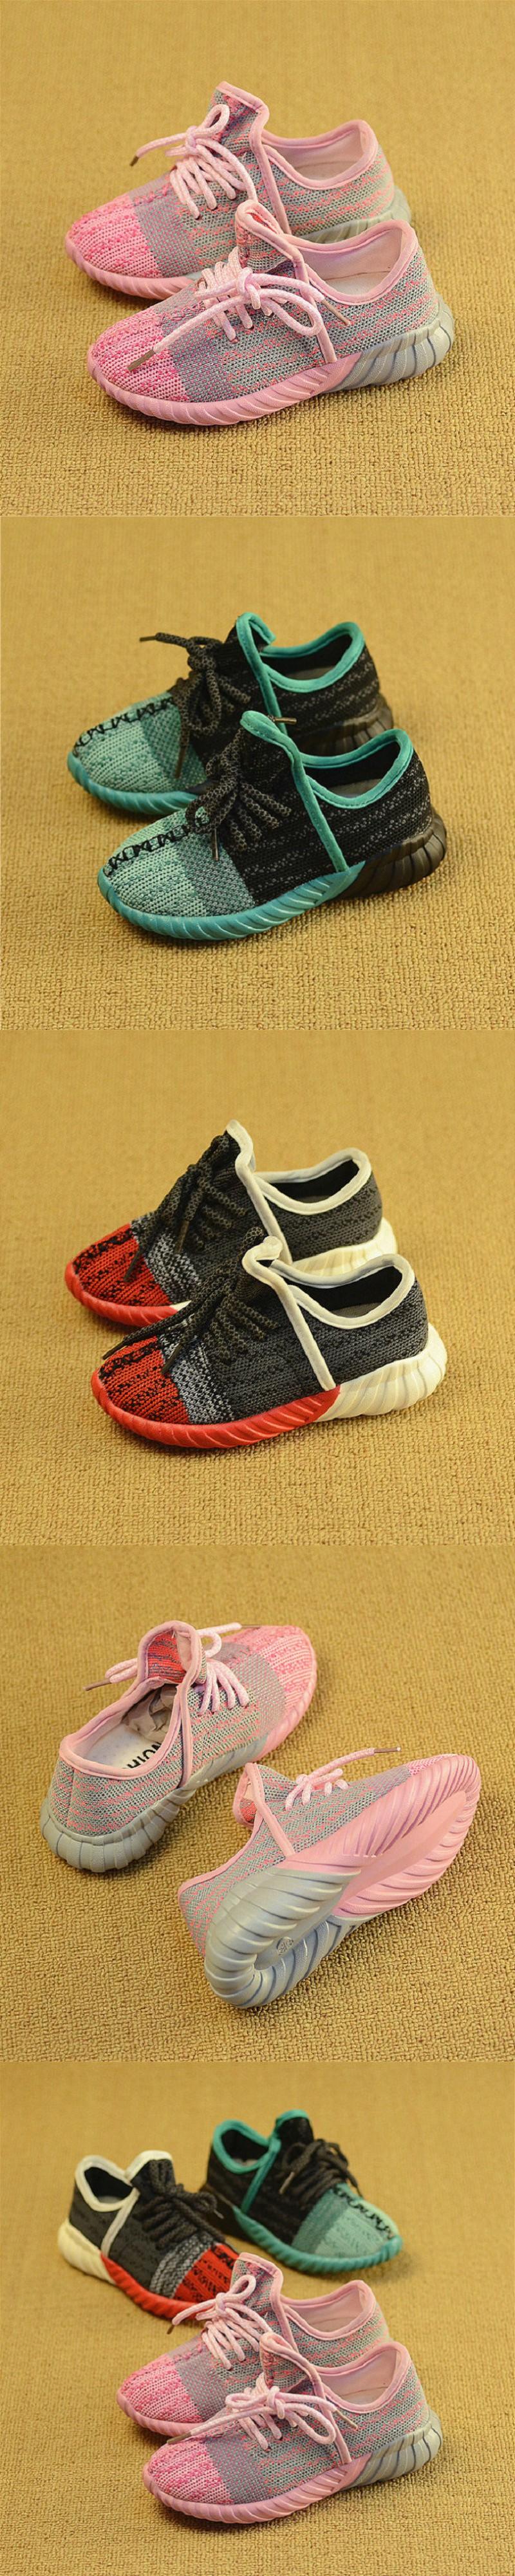 2016 New Autumn children Air Mesh shoes girls boys sport shoes antislip soft bottom kids shoe comfortable breathable sneakers